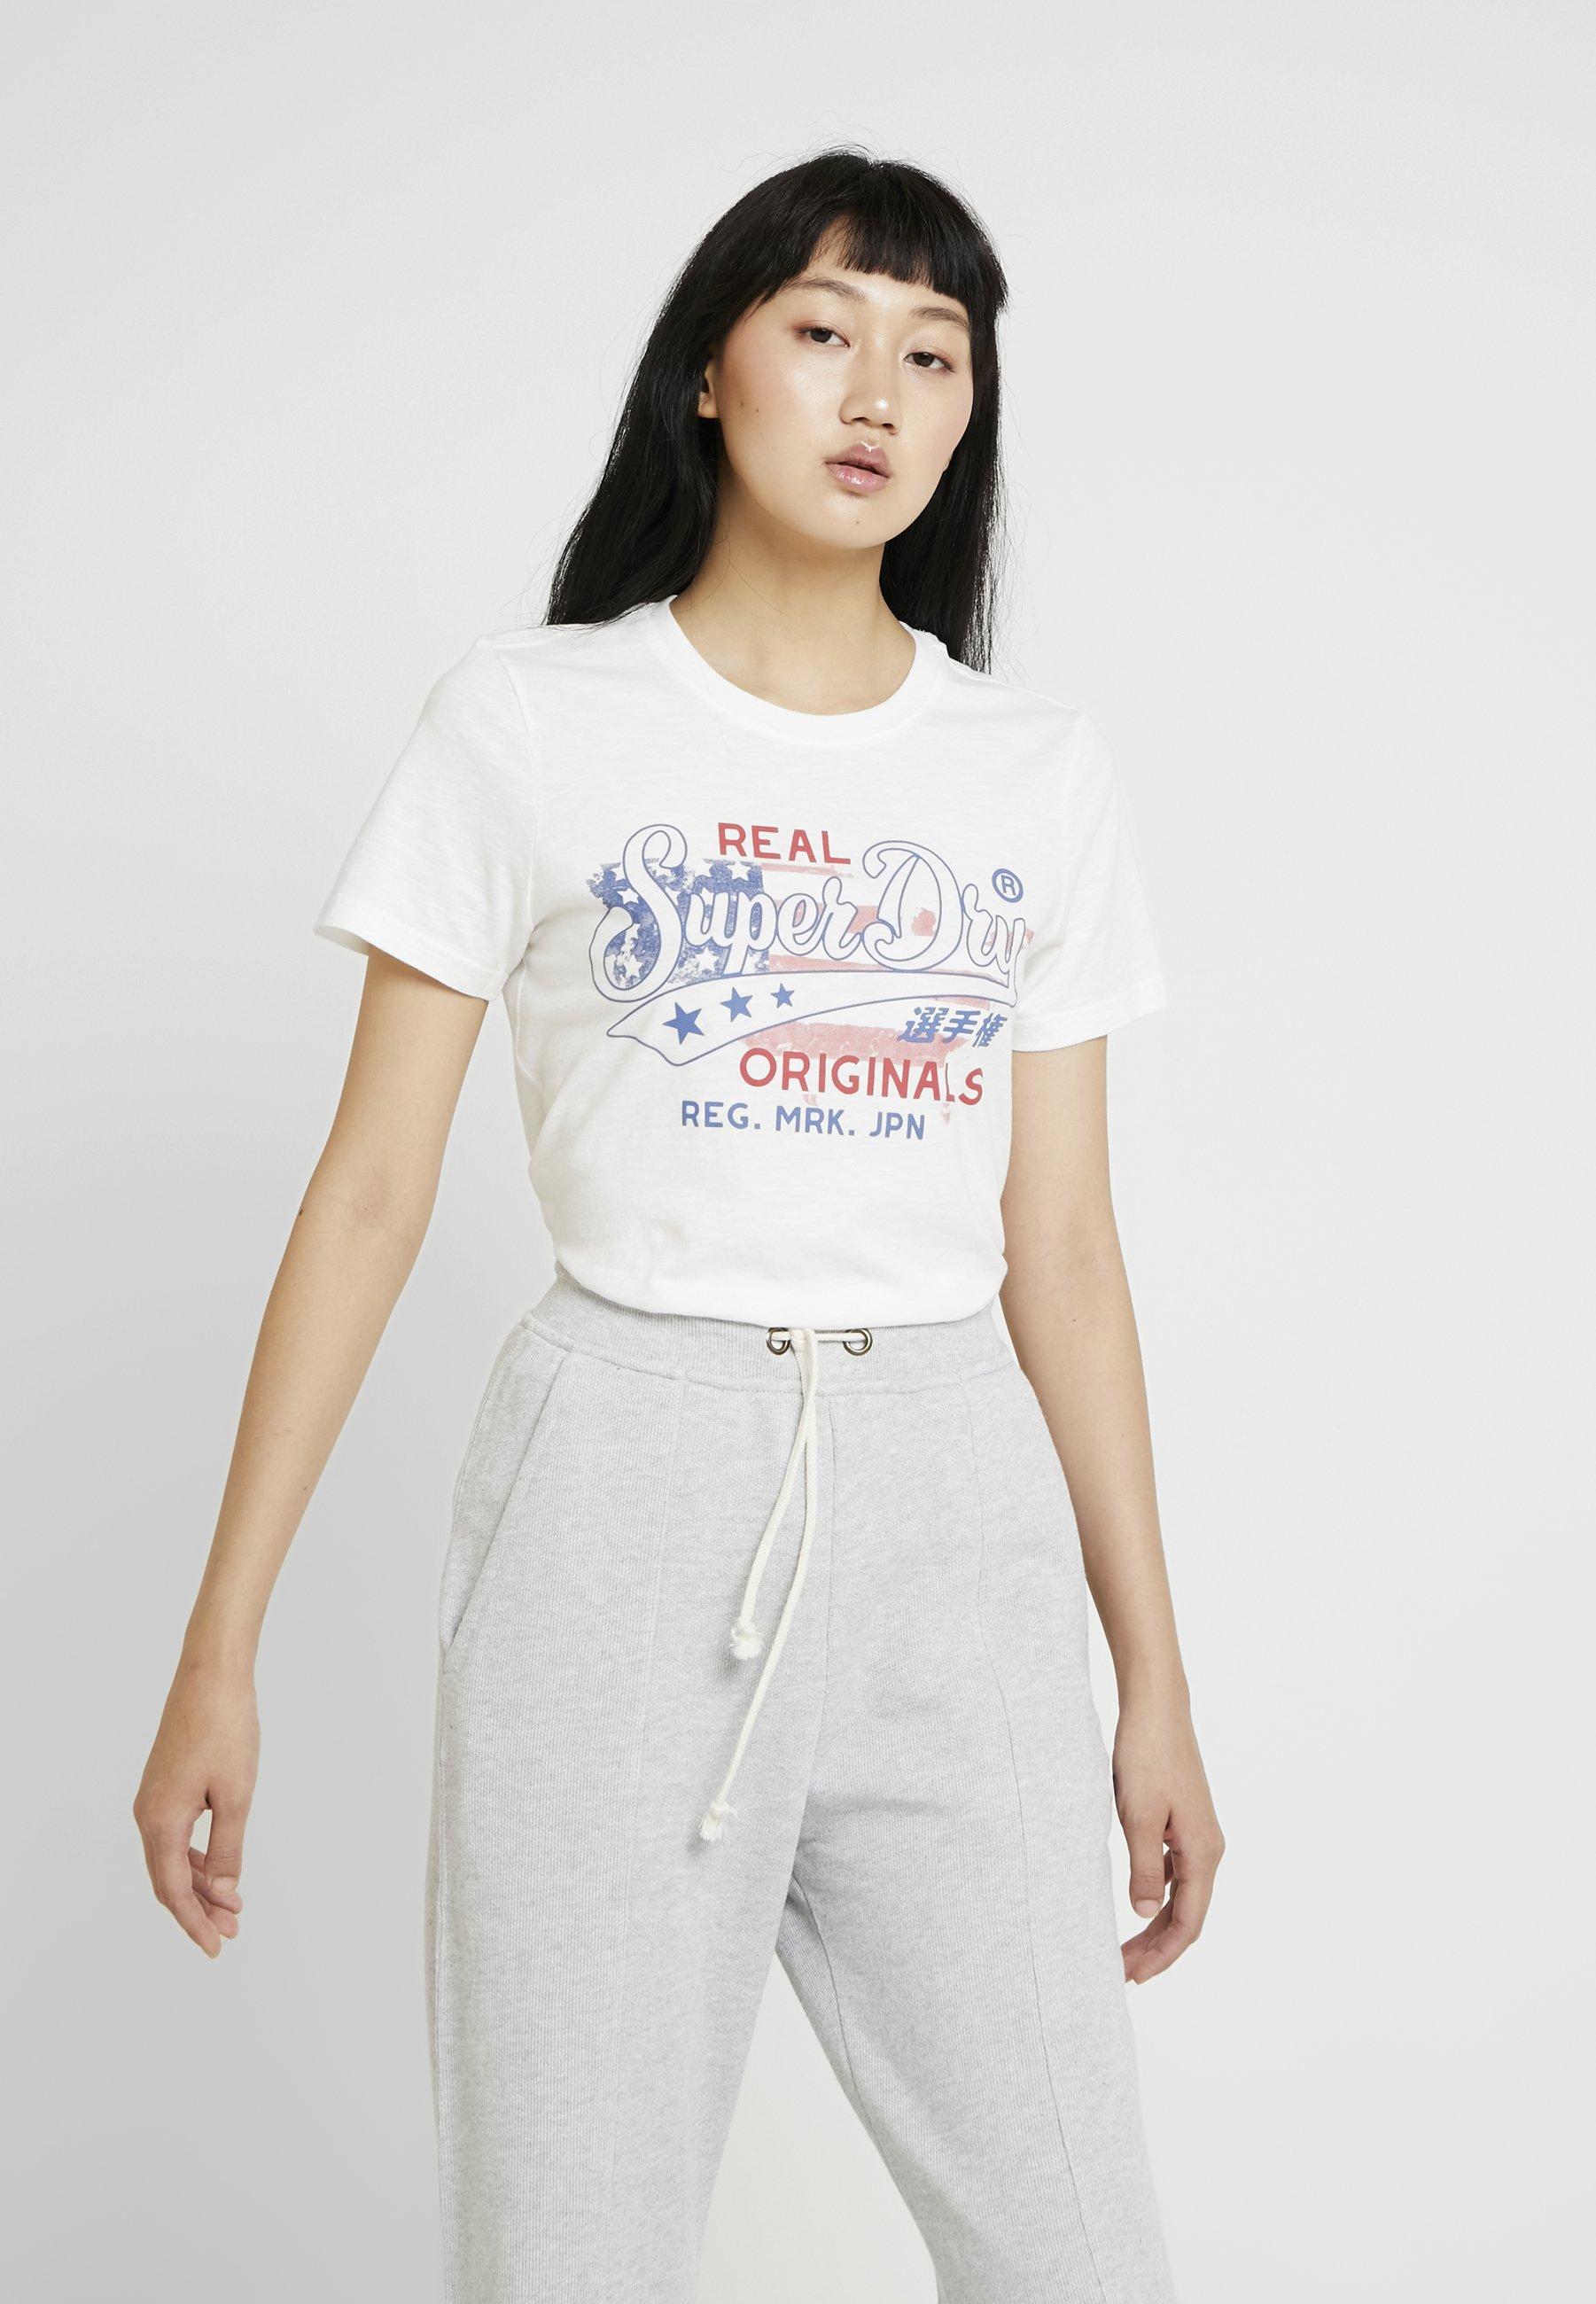 Originals Slub TeeT White shirt Superdry Entry Real Flag Imprimé Chalk Y76gbfy